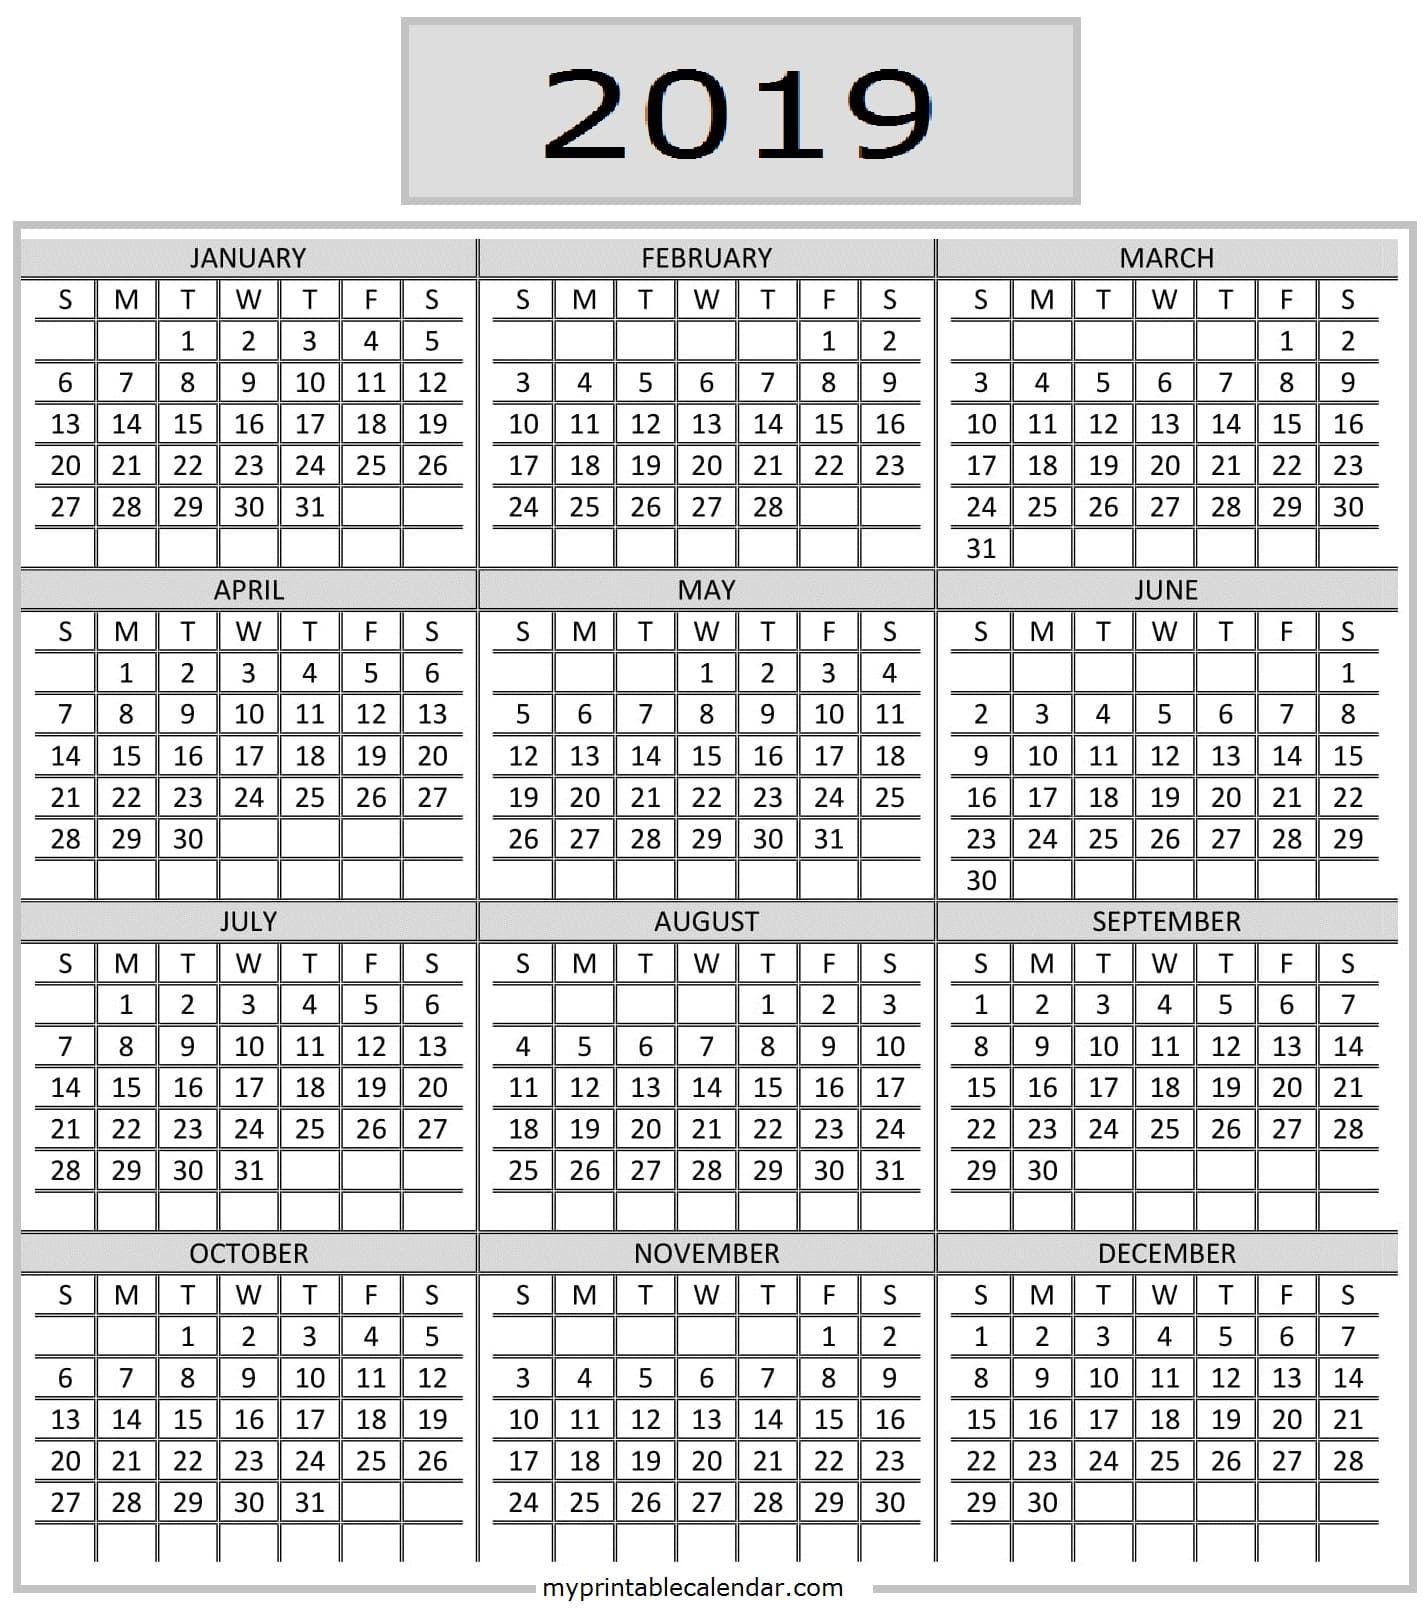 Pocket Calendar 2019 Printable | Calendar 2019 Printable in Printable Pocket Calender